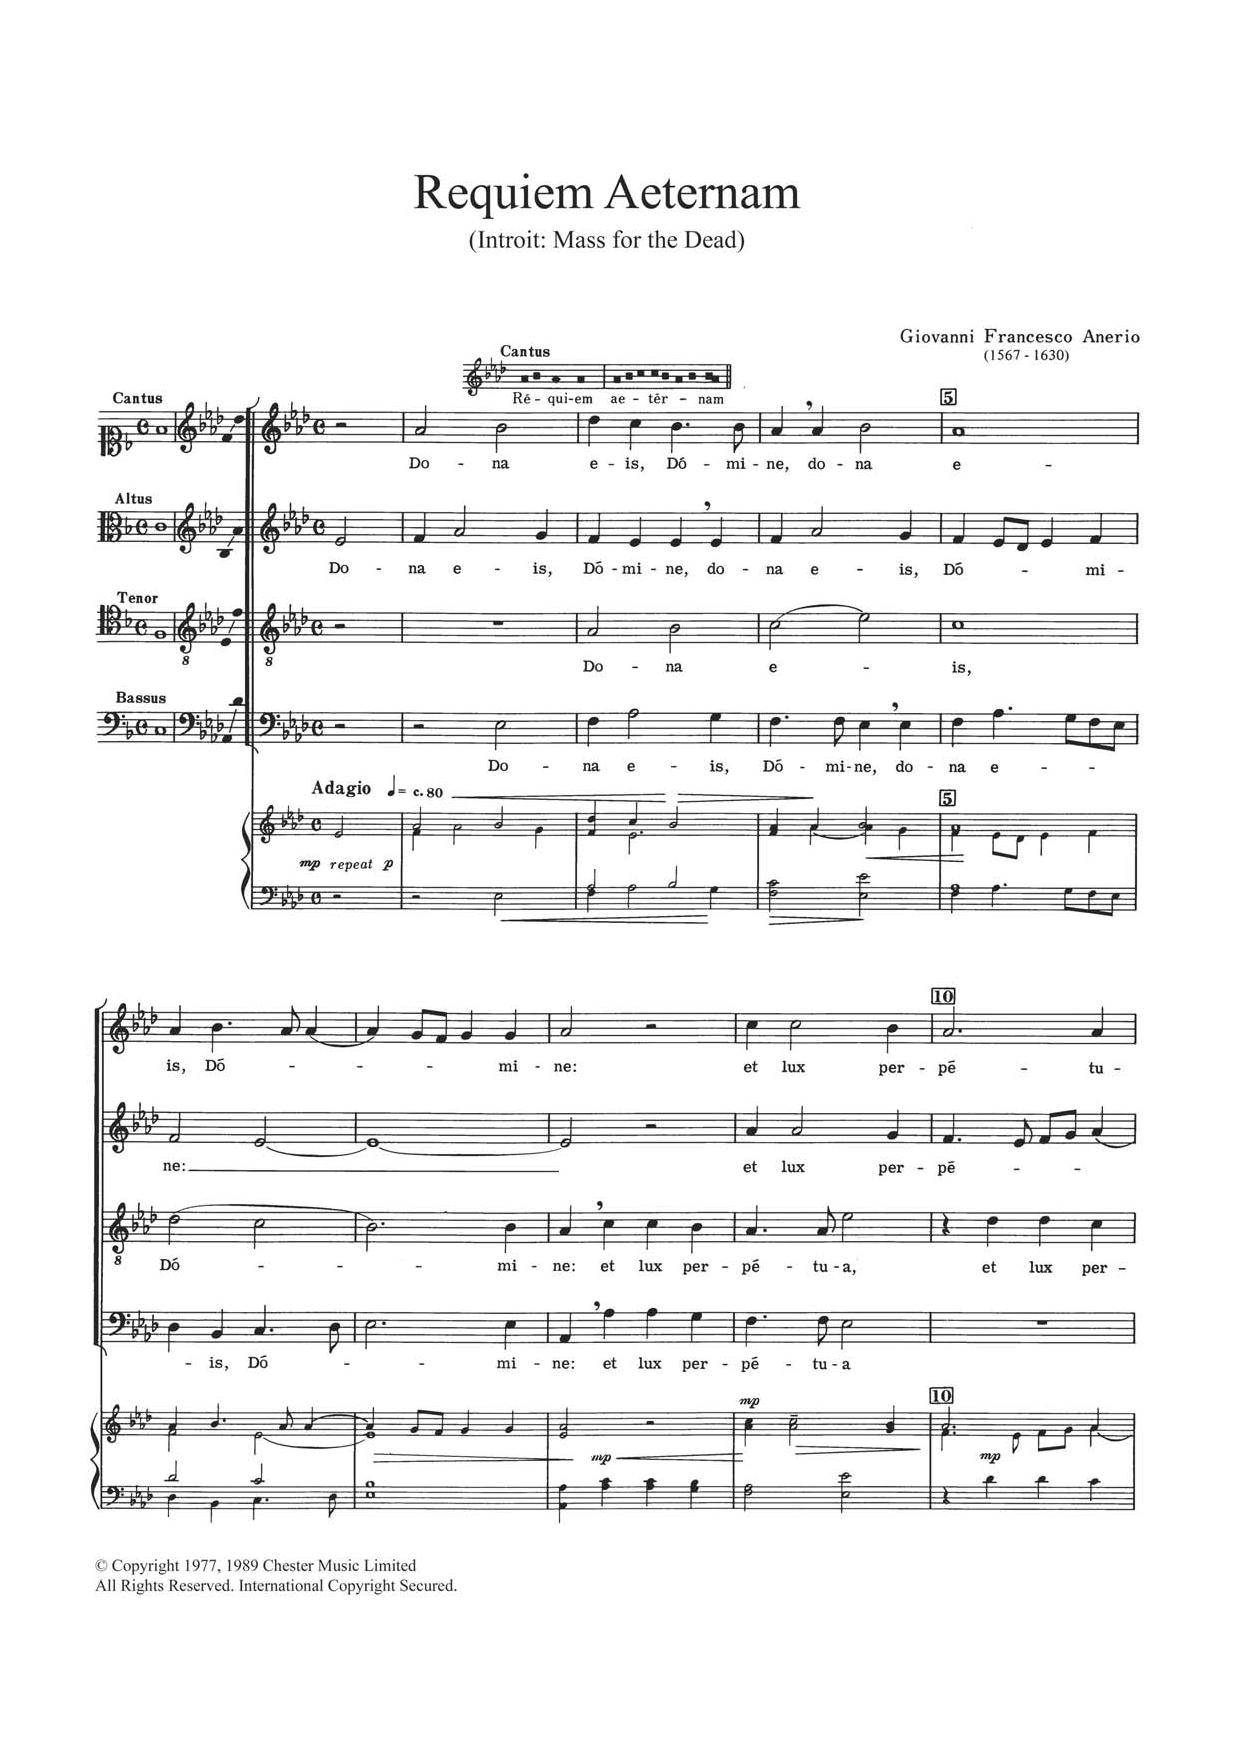 Requiem Aeternam Sheet Music